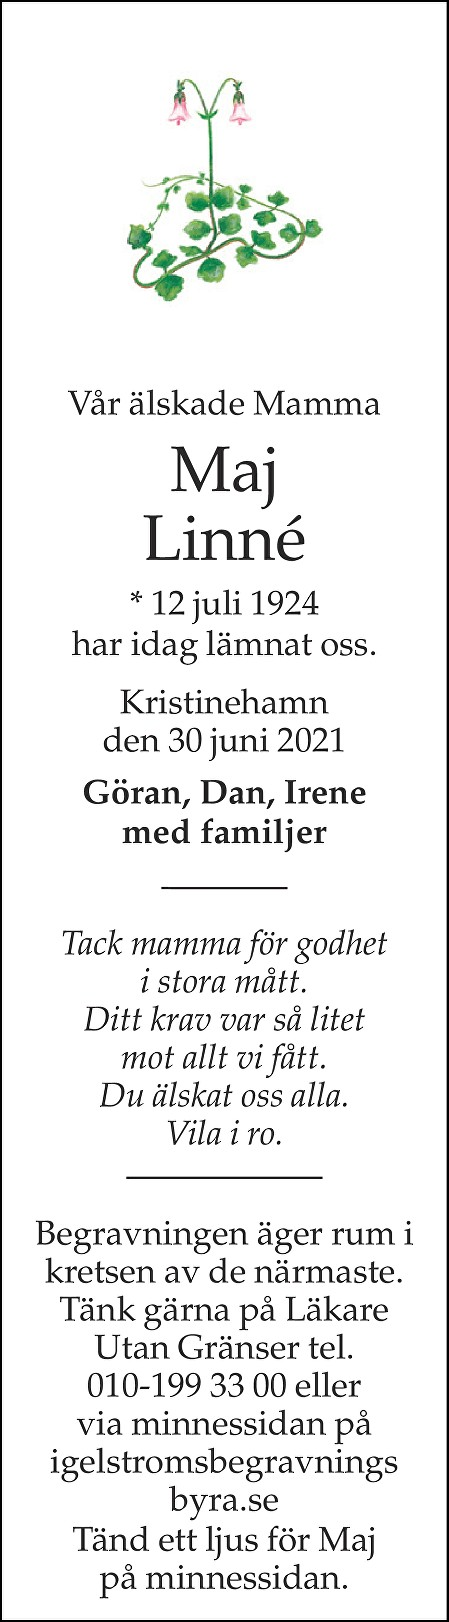 Maj Linné Death notice